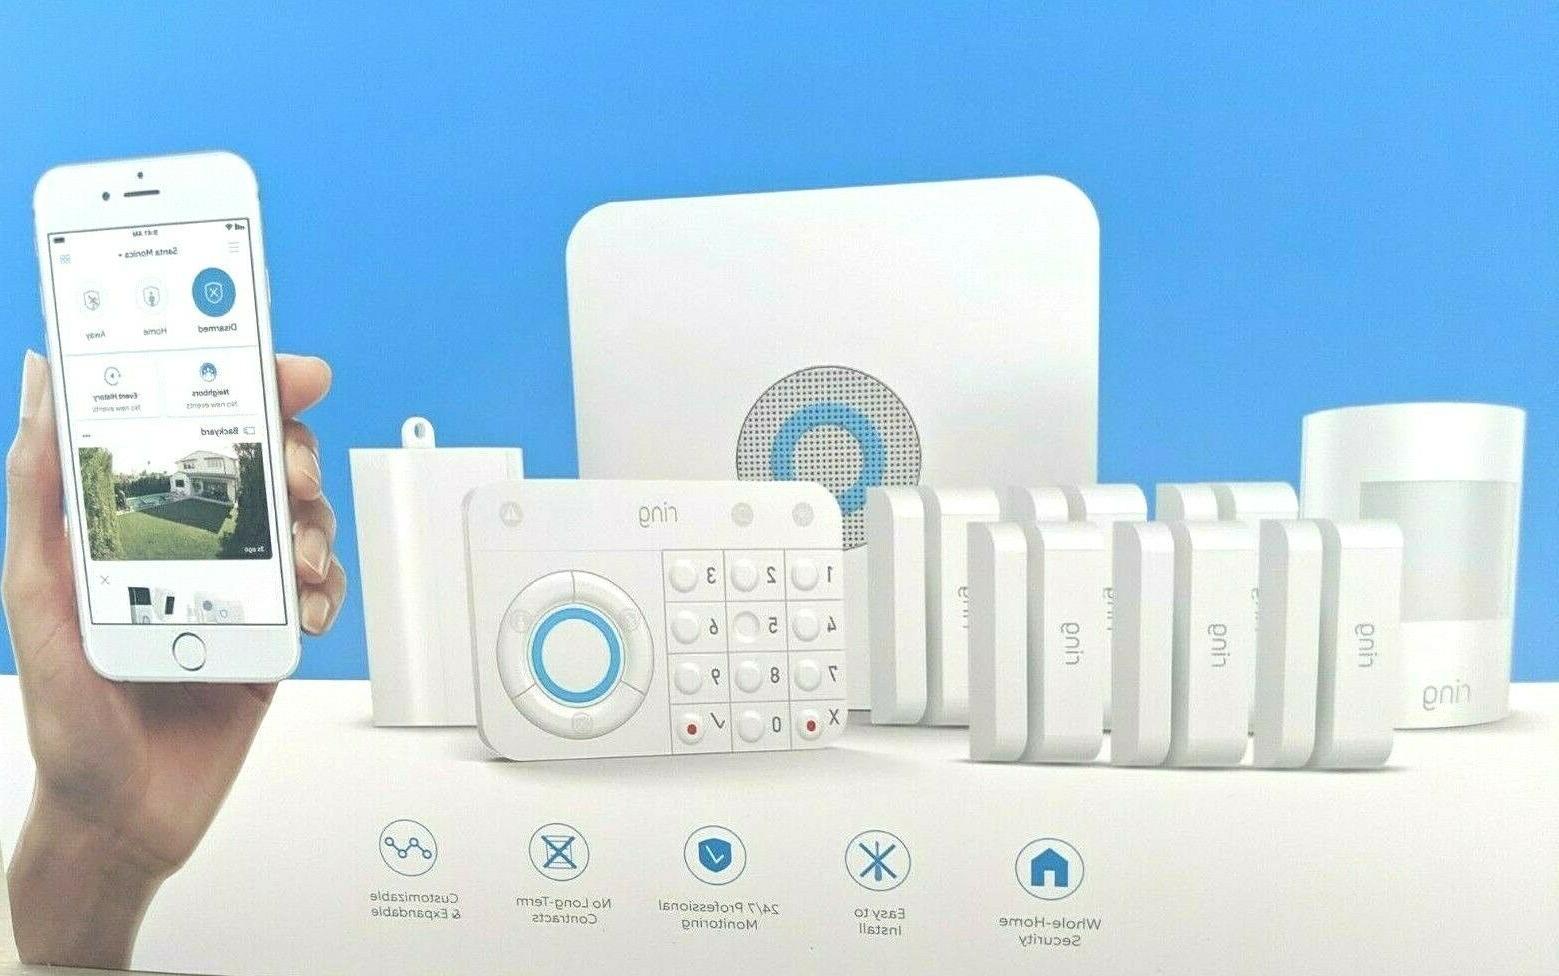 NEW Alarm Wireless Security Home System - Piece Kit Smart